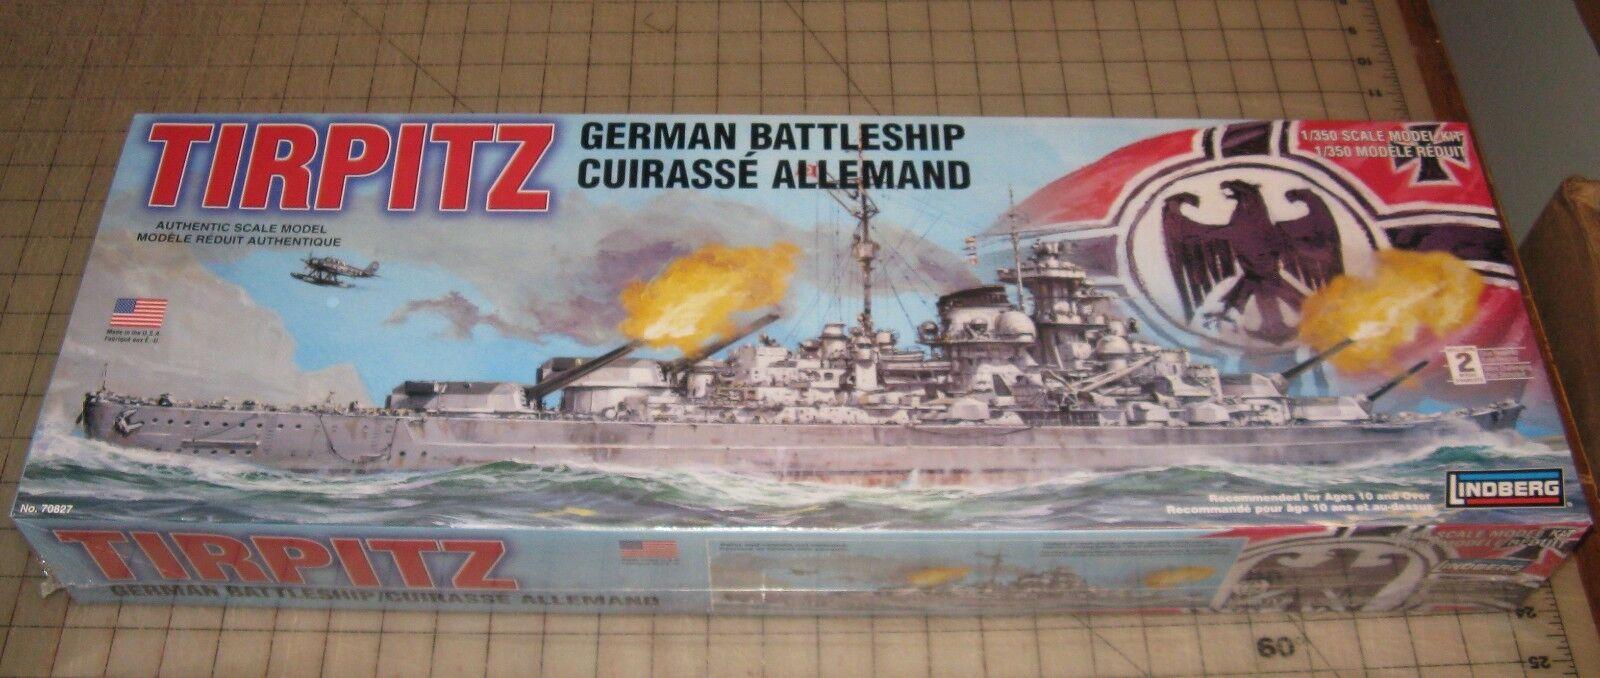 Lindberg WWII German Battleship TIRPITZ Plastic Model Kit 1 350 Scale NEW